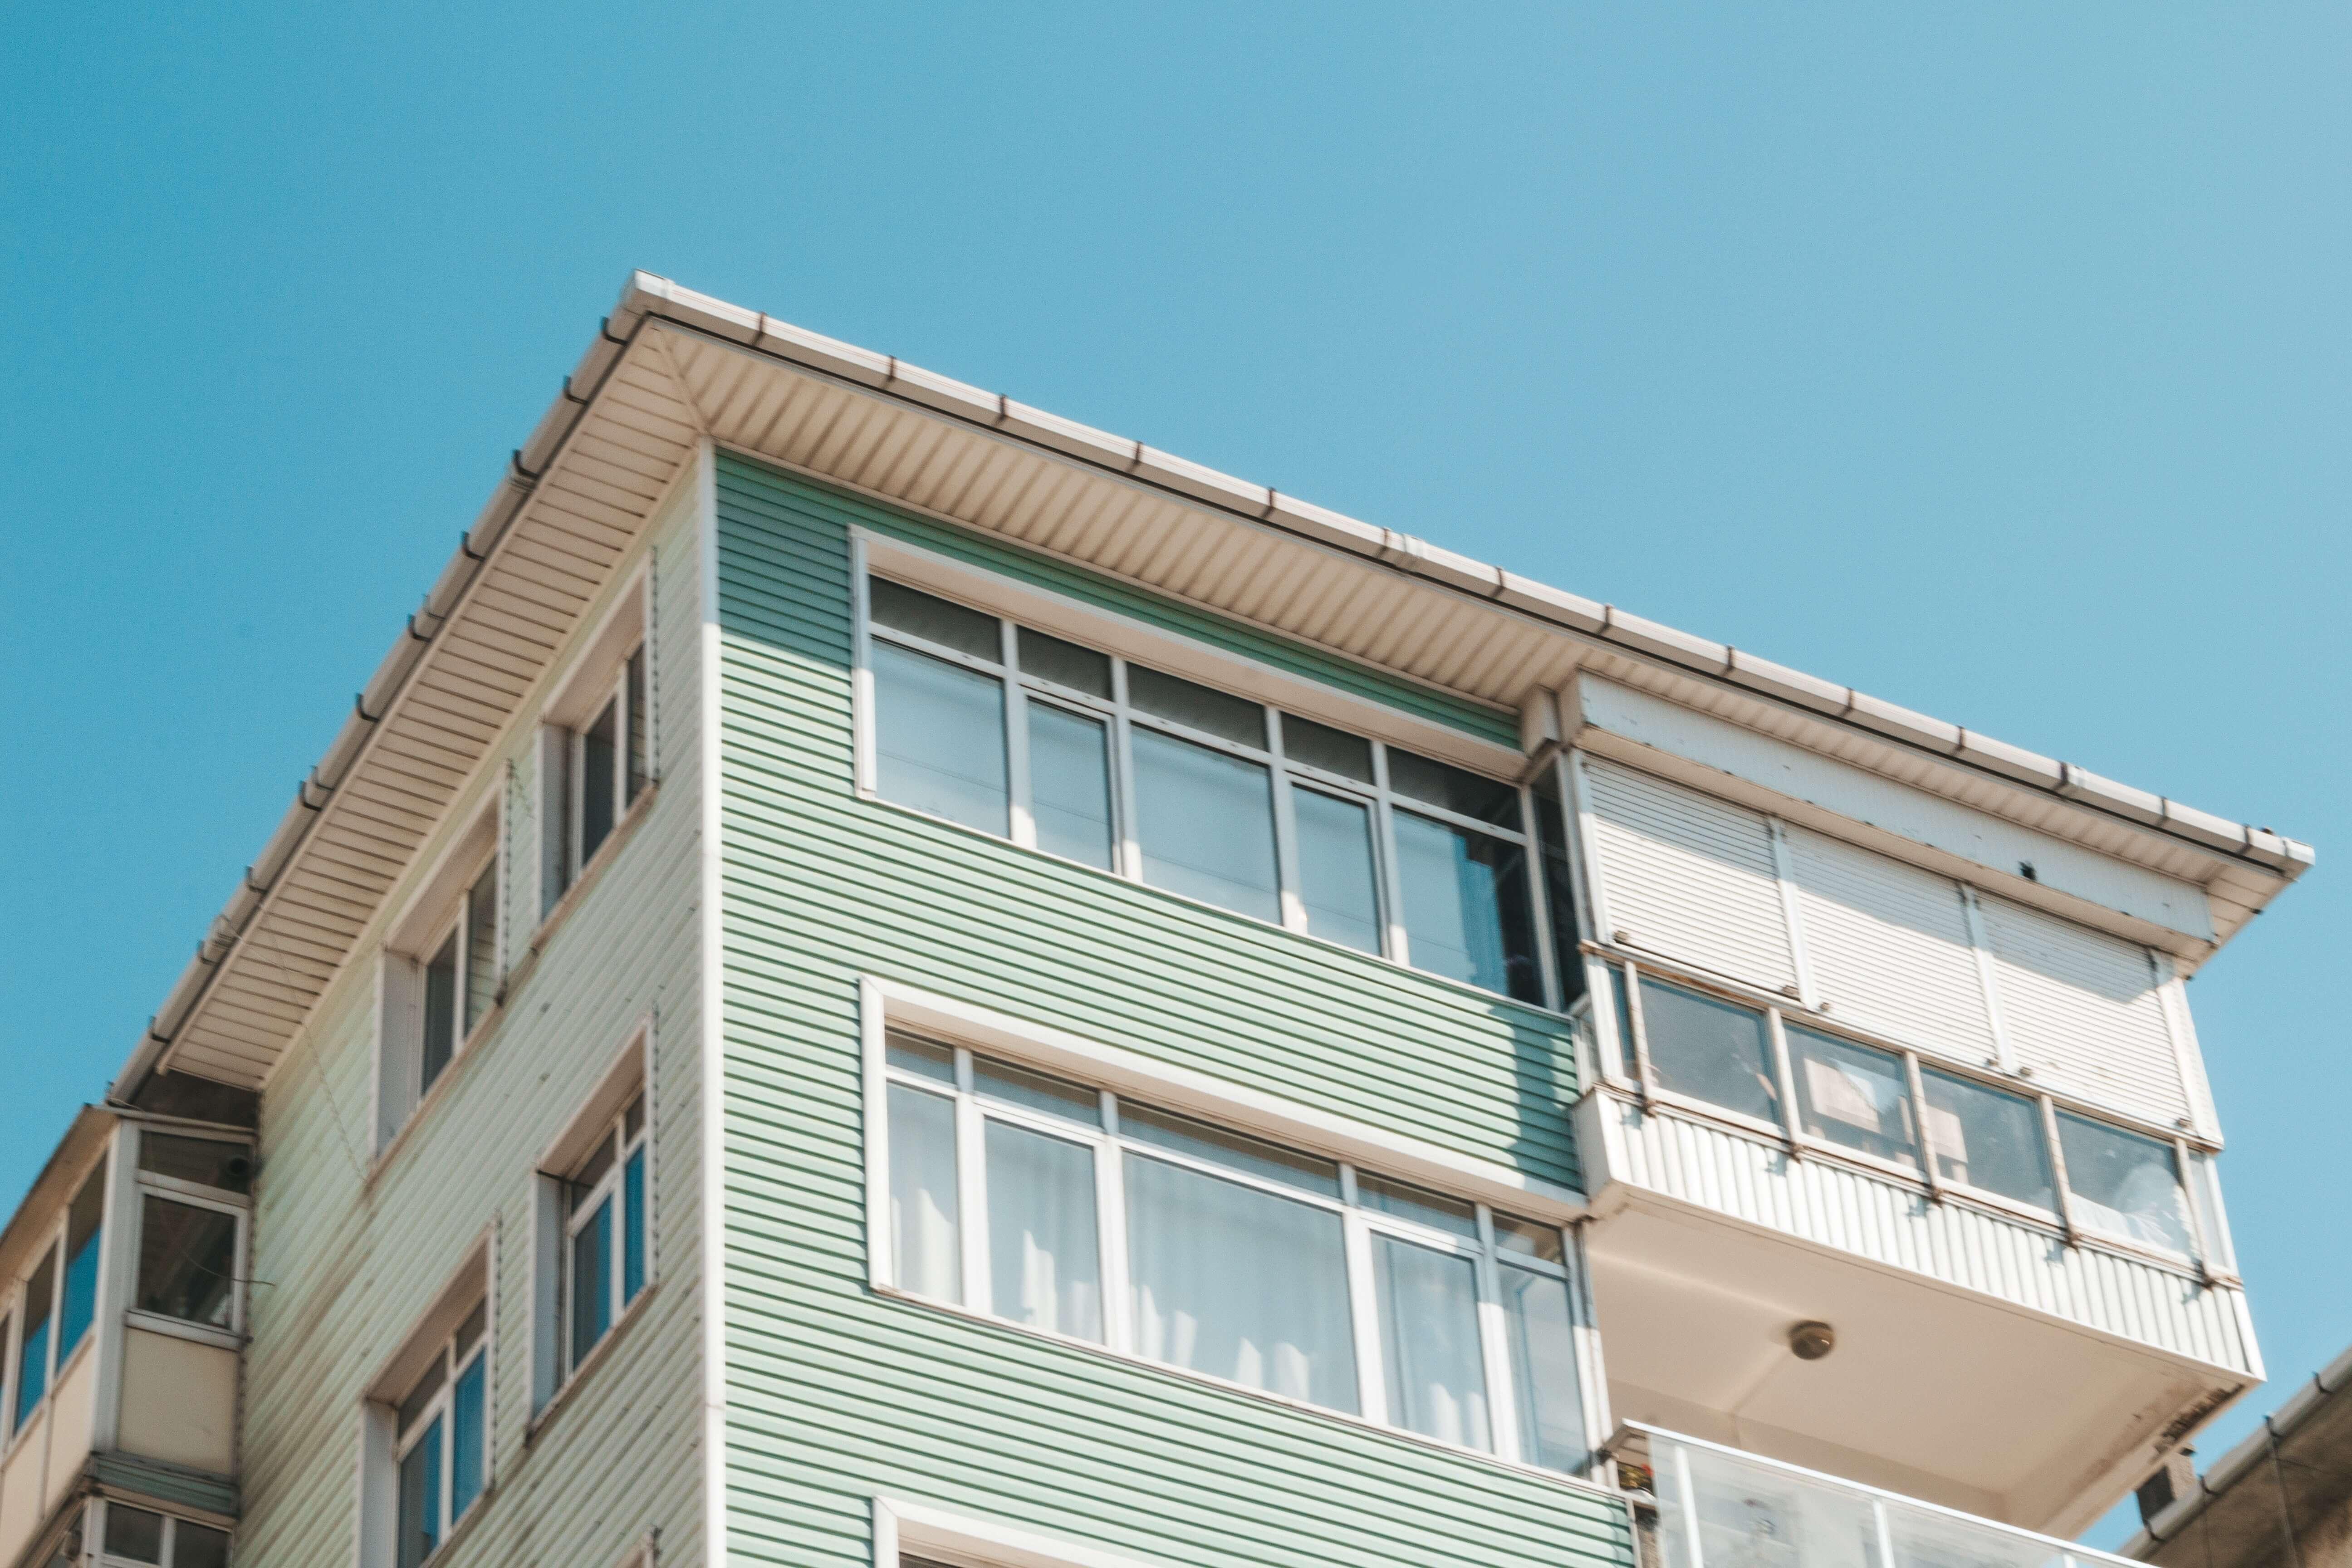 budynek-z-oknami